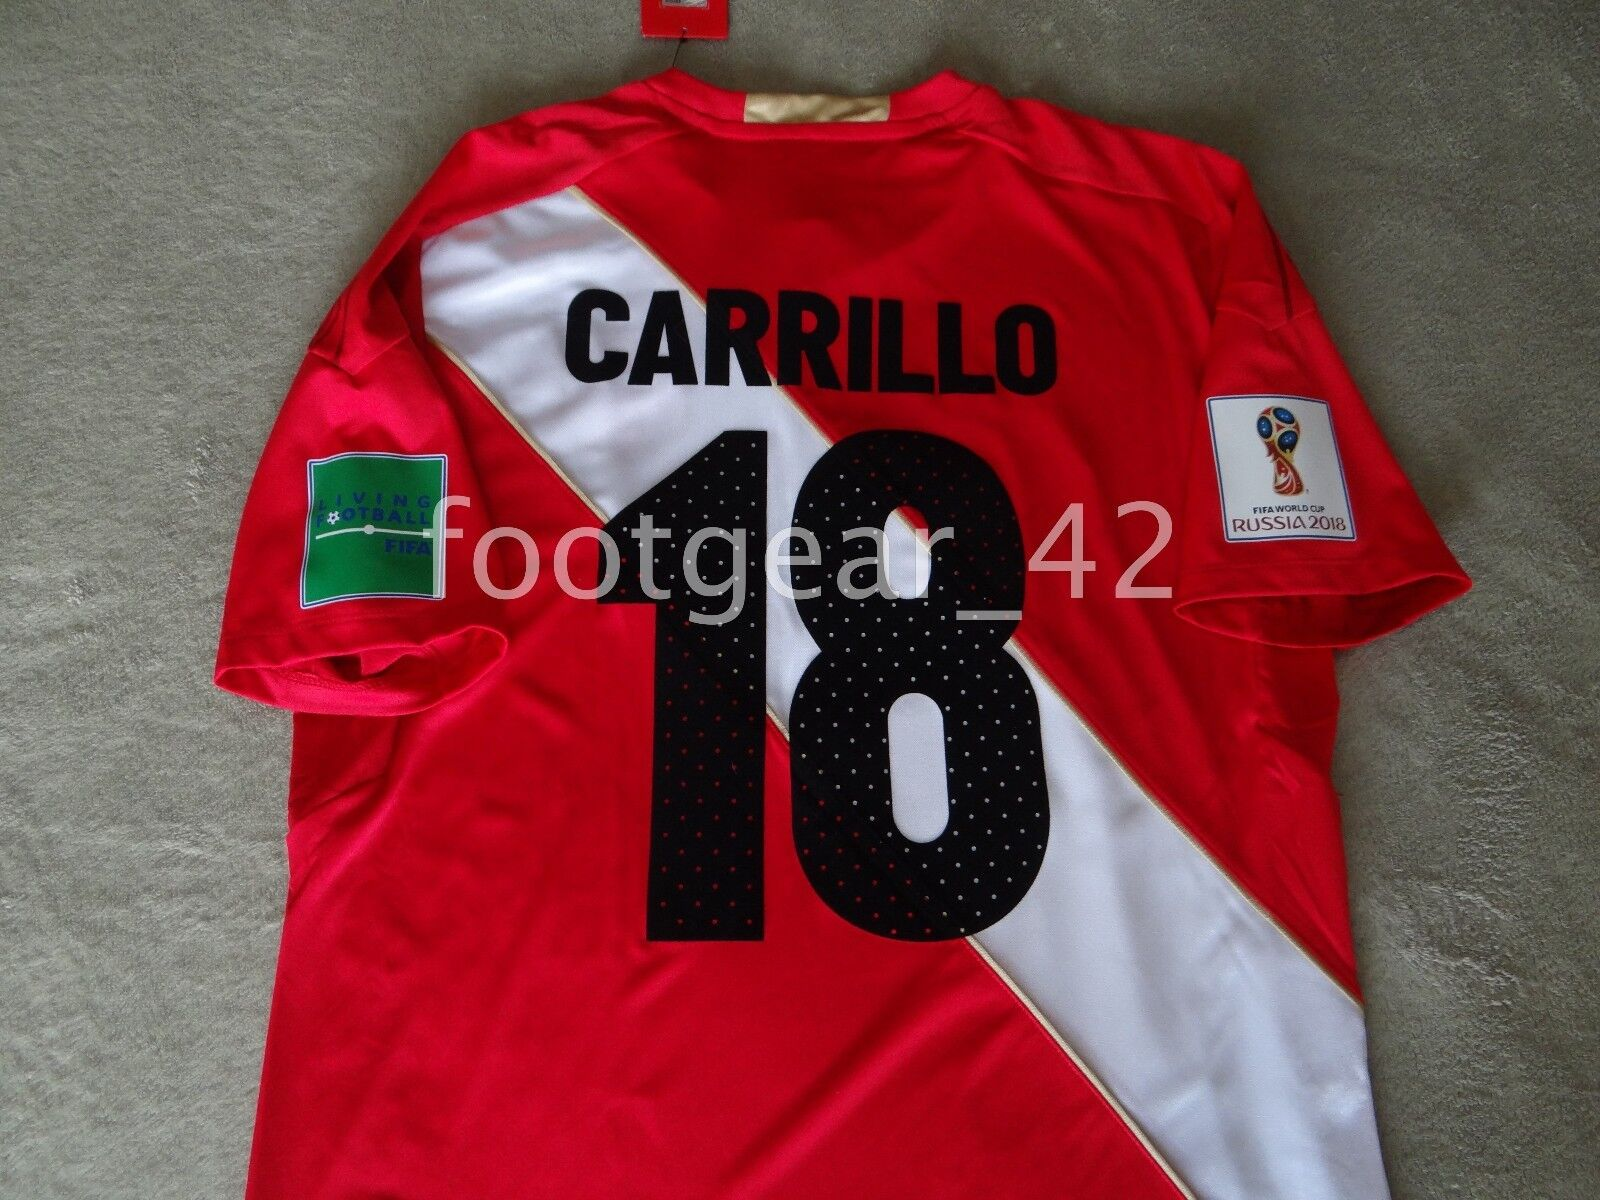 Nuevo Umbro Perú oficial Andre Carrillo Auténtico Camisa Jersey Rusia WC 2018 M L